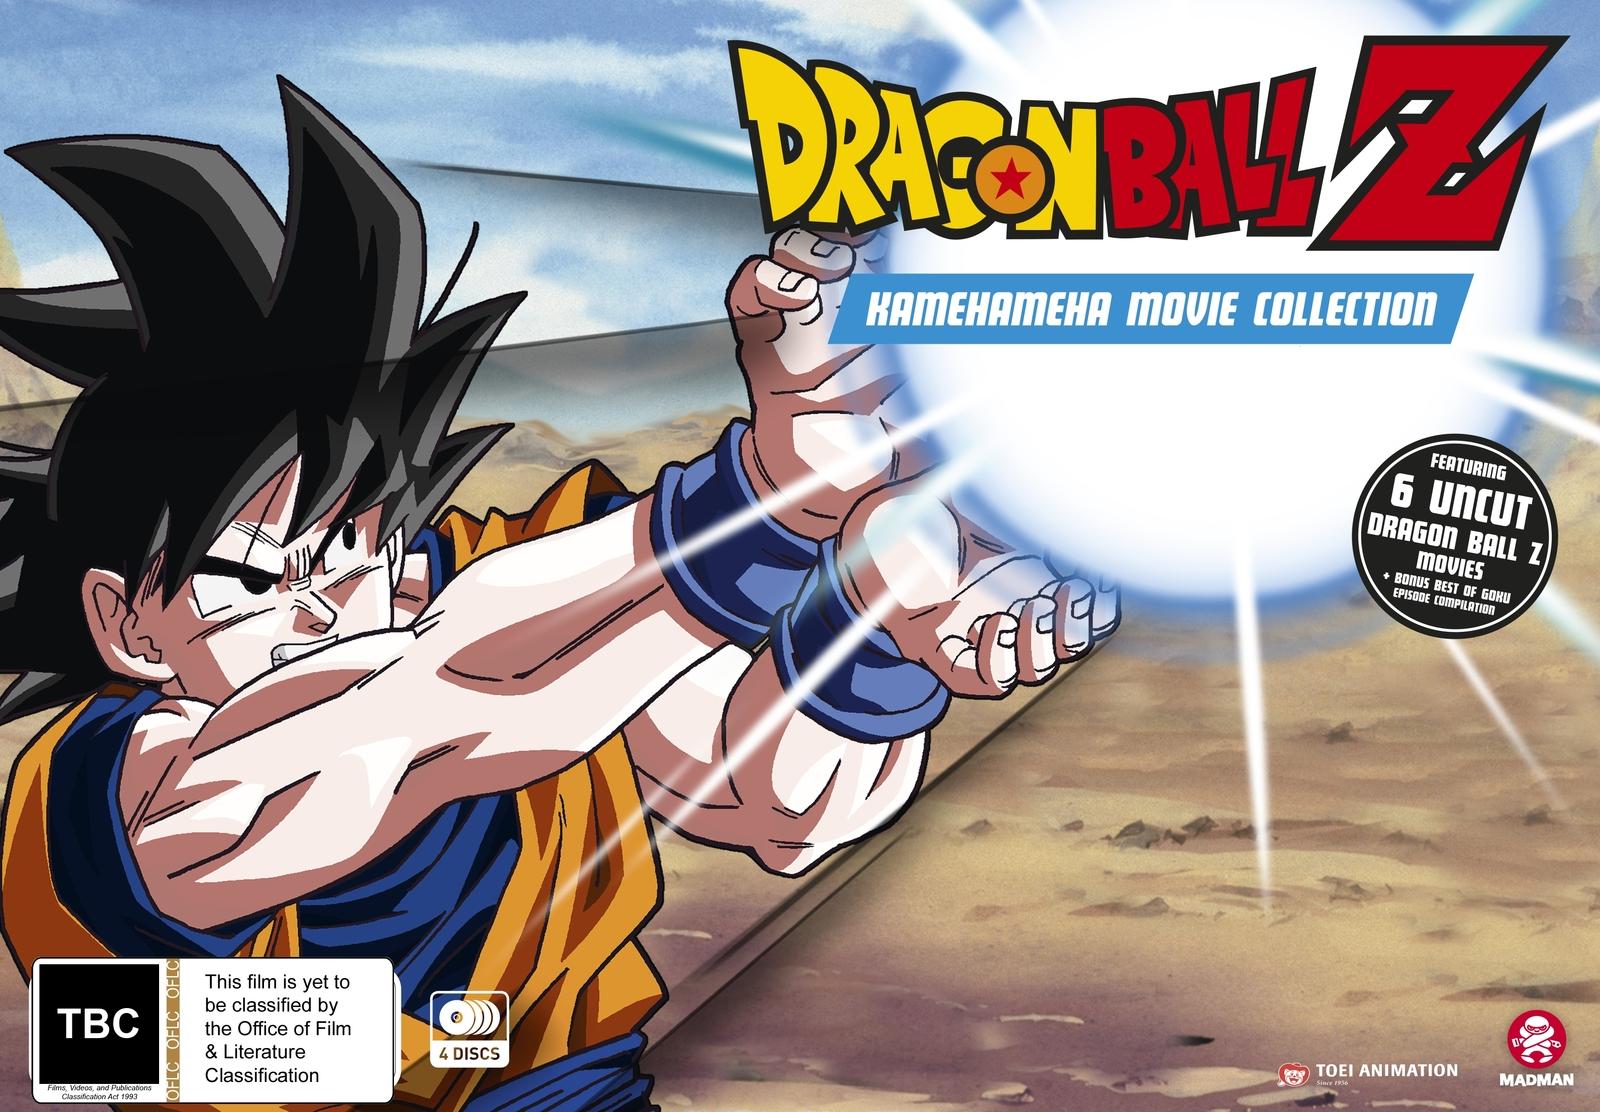 Dragon Ball Z: Kamehameha Movie Collection on DVD image